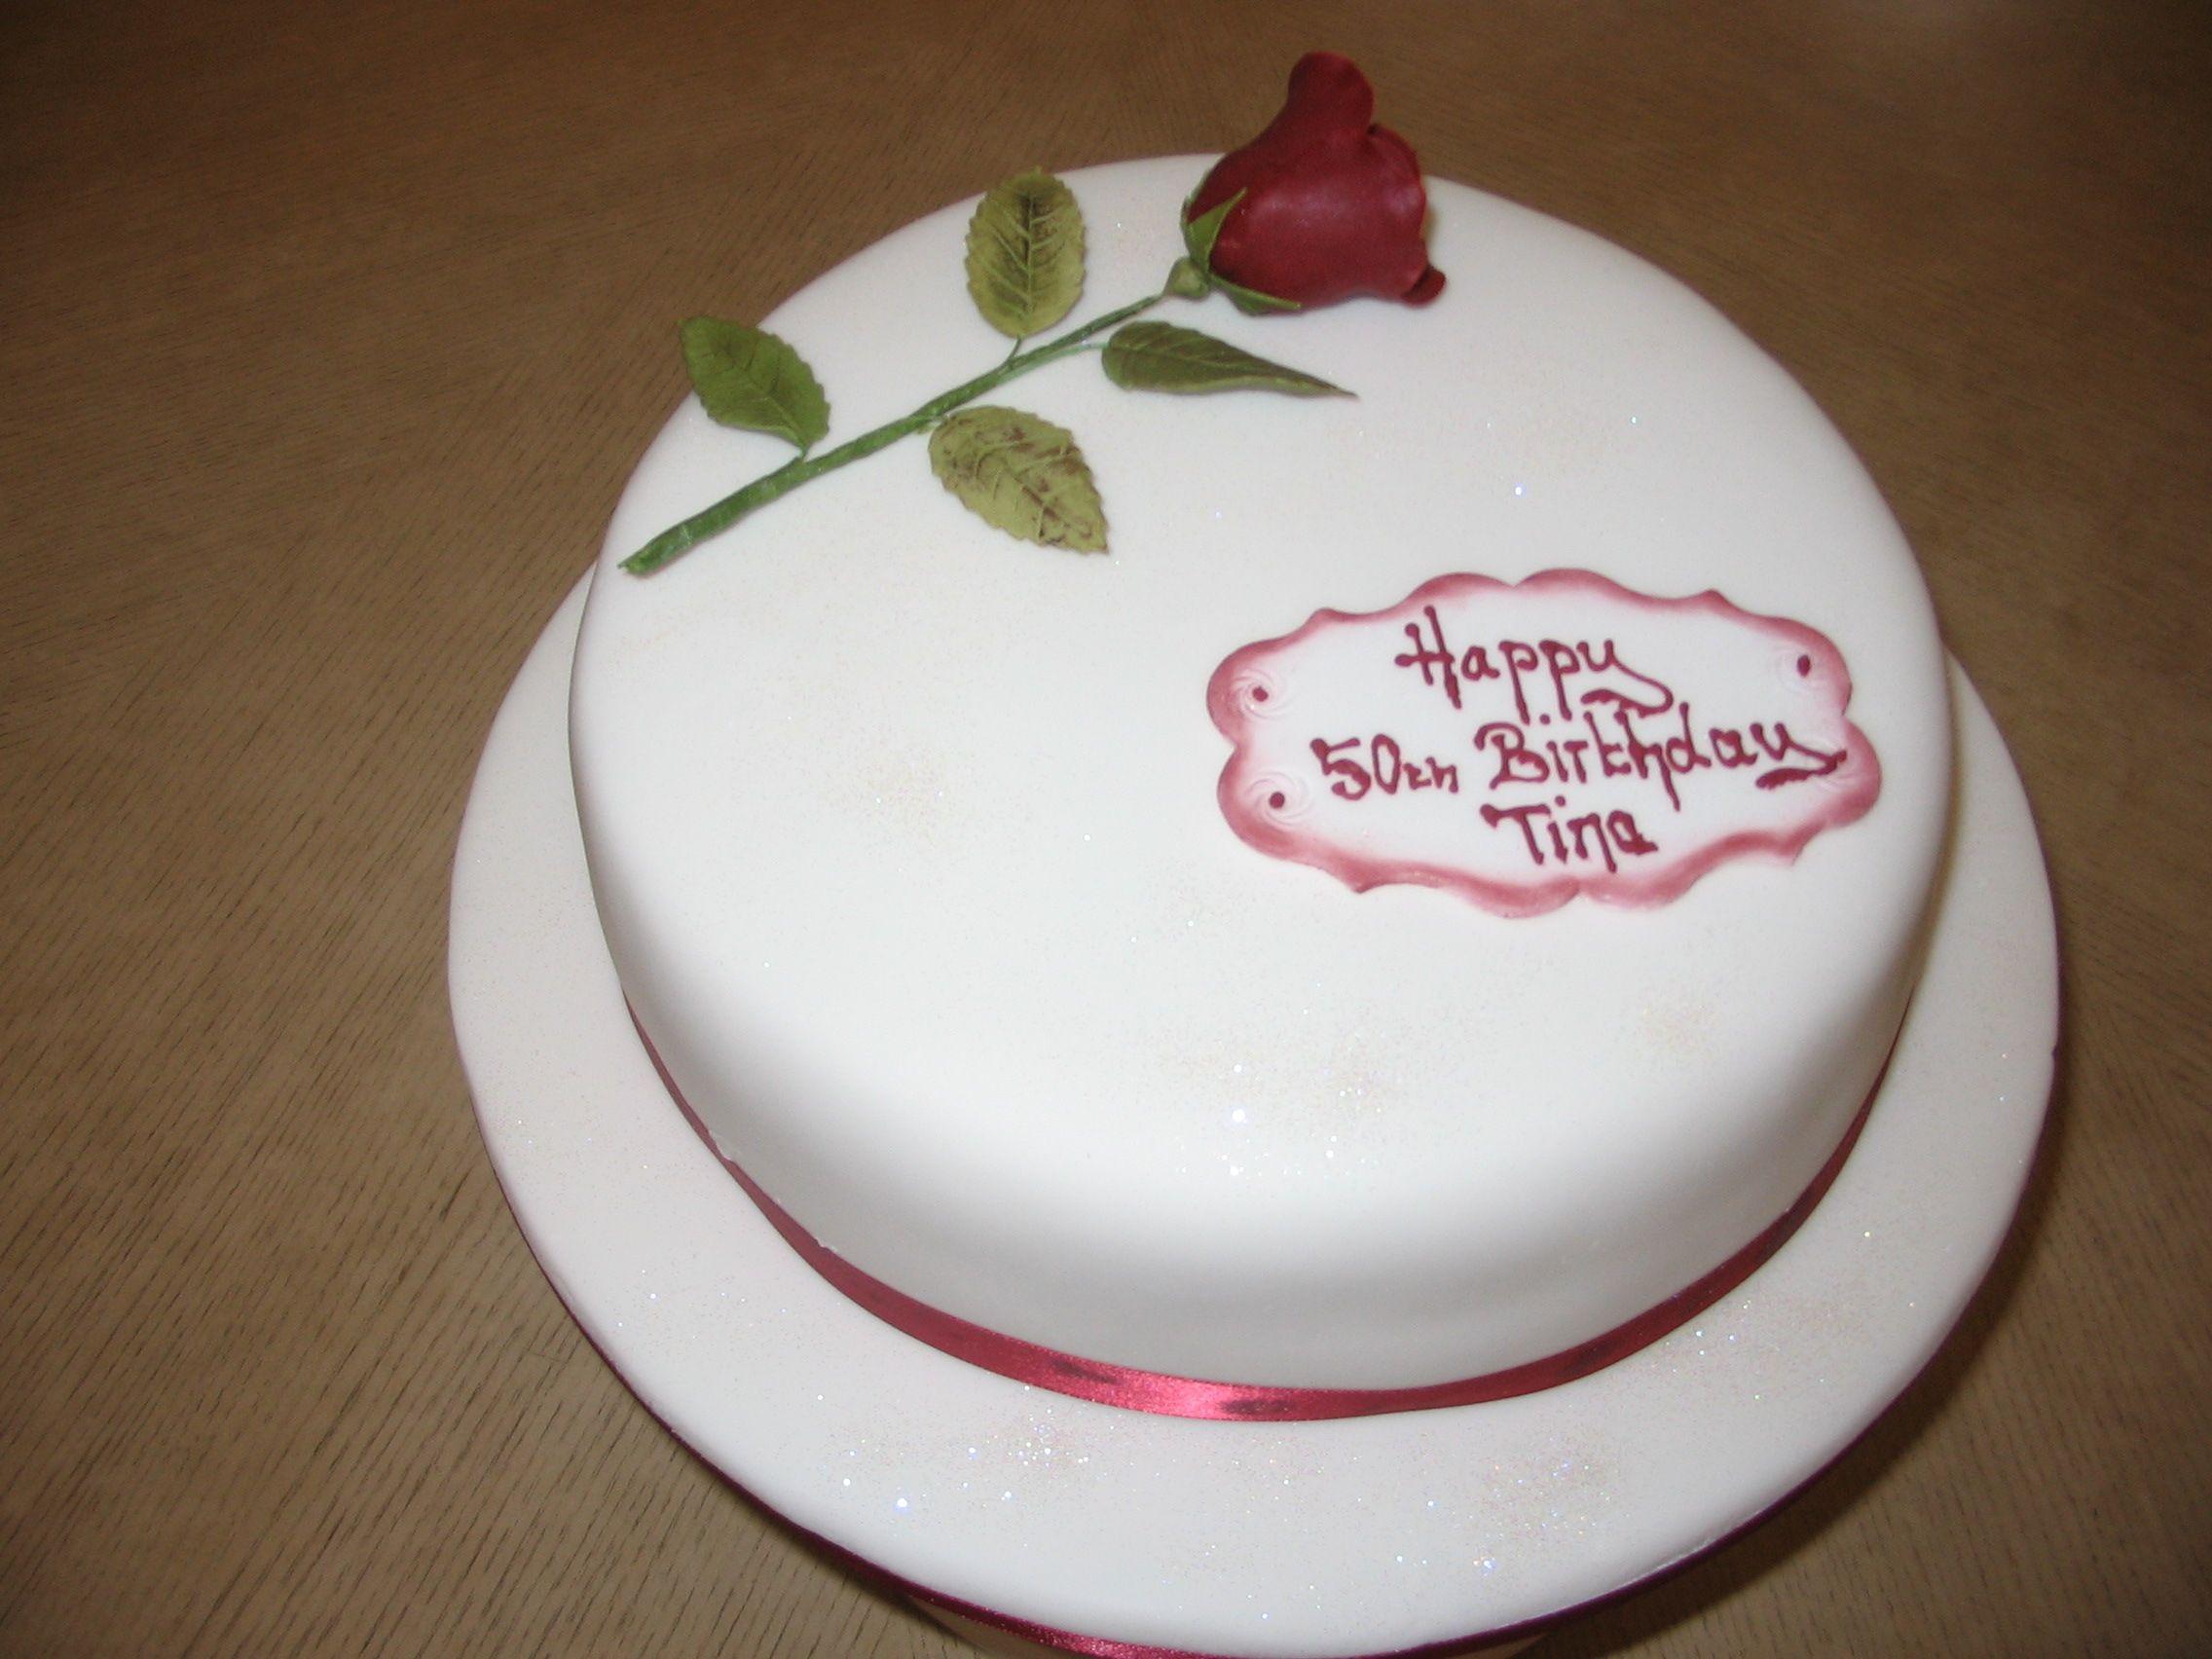 Happy Birthday Card Online Dear Verito Estelita – Birthday Cards Photo Editing